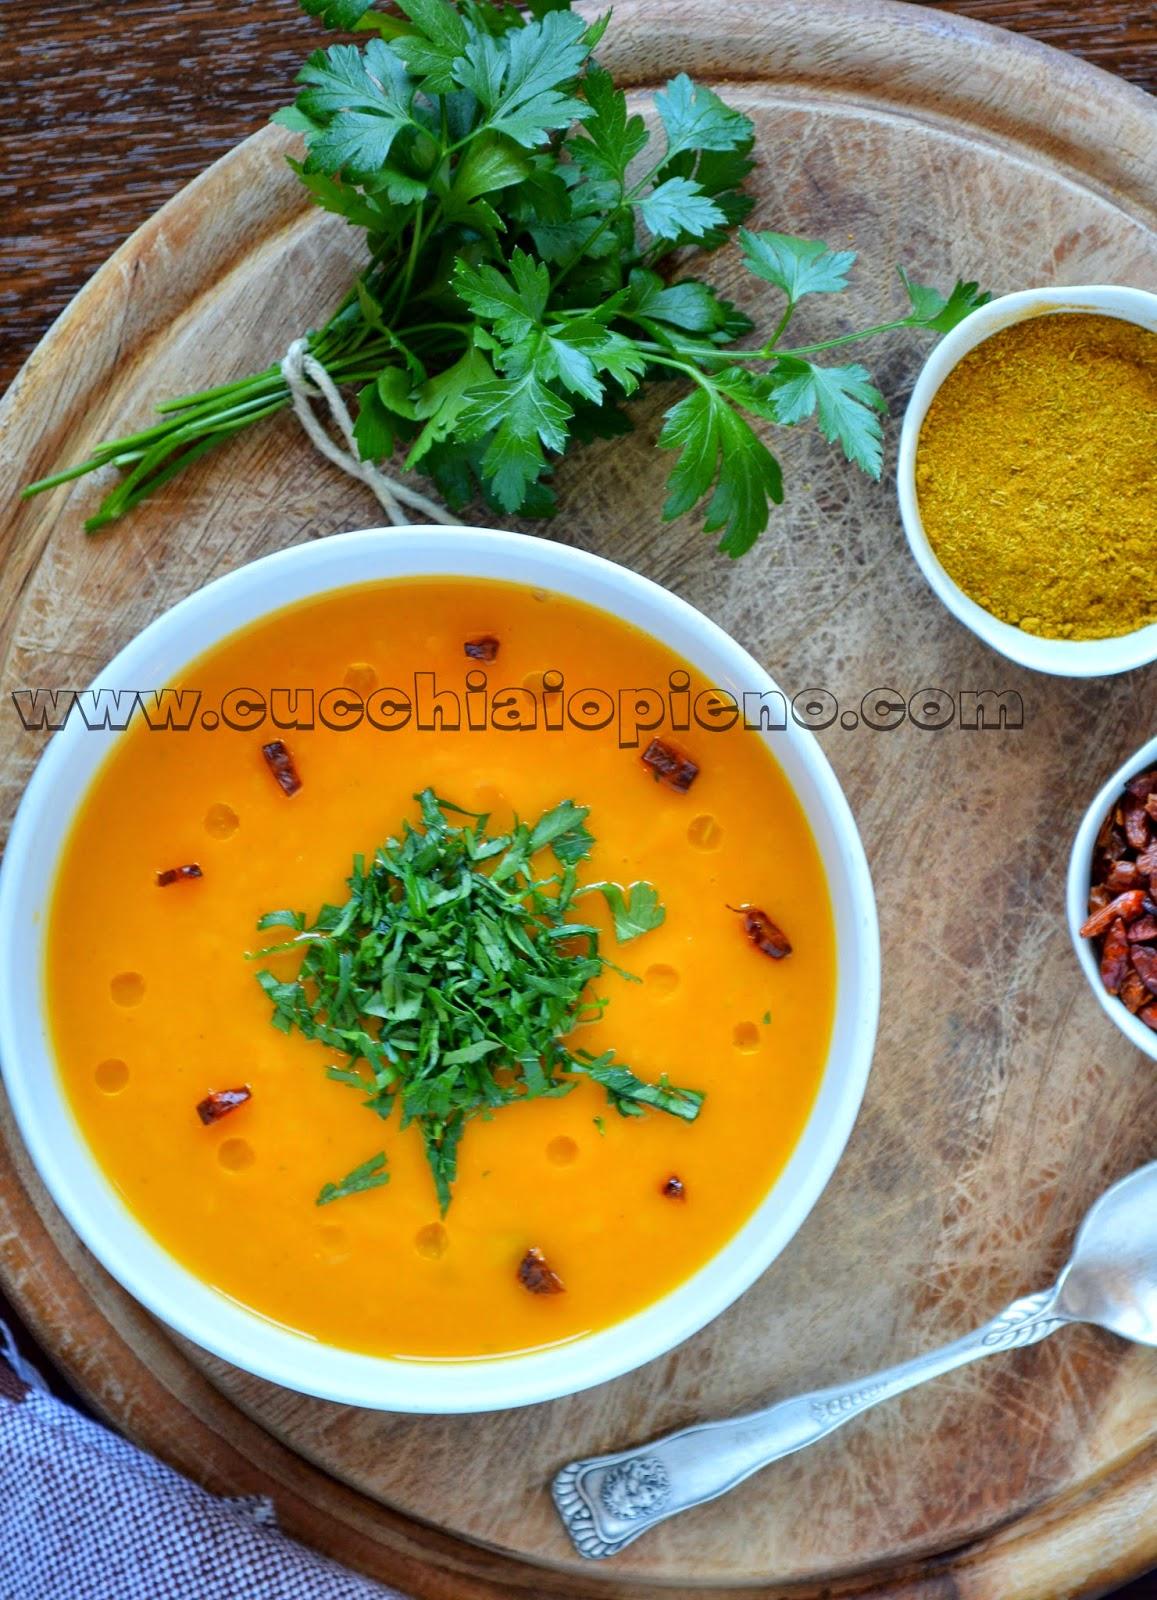 sopa de batata-doce indiana